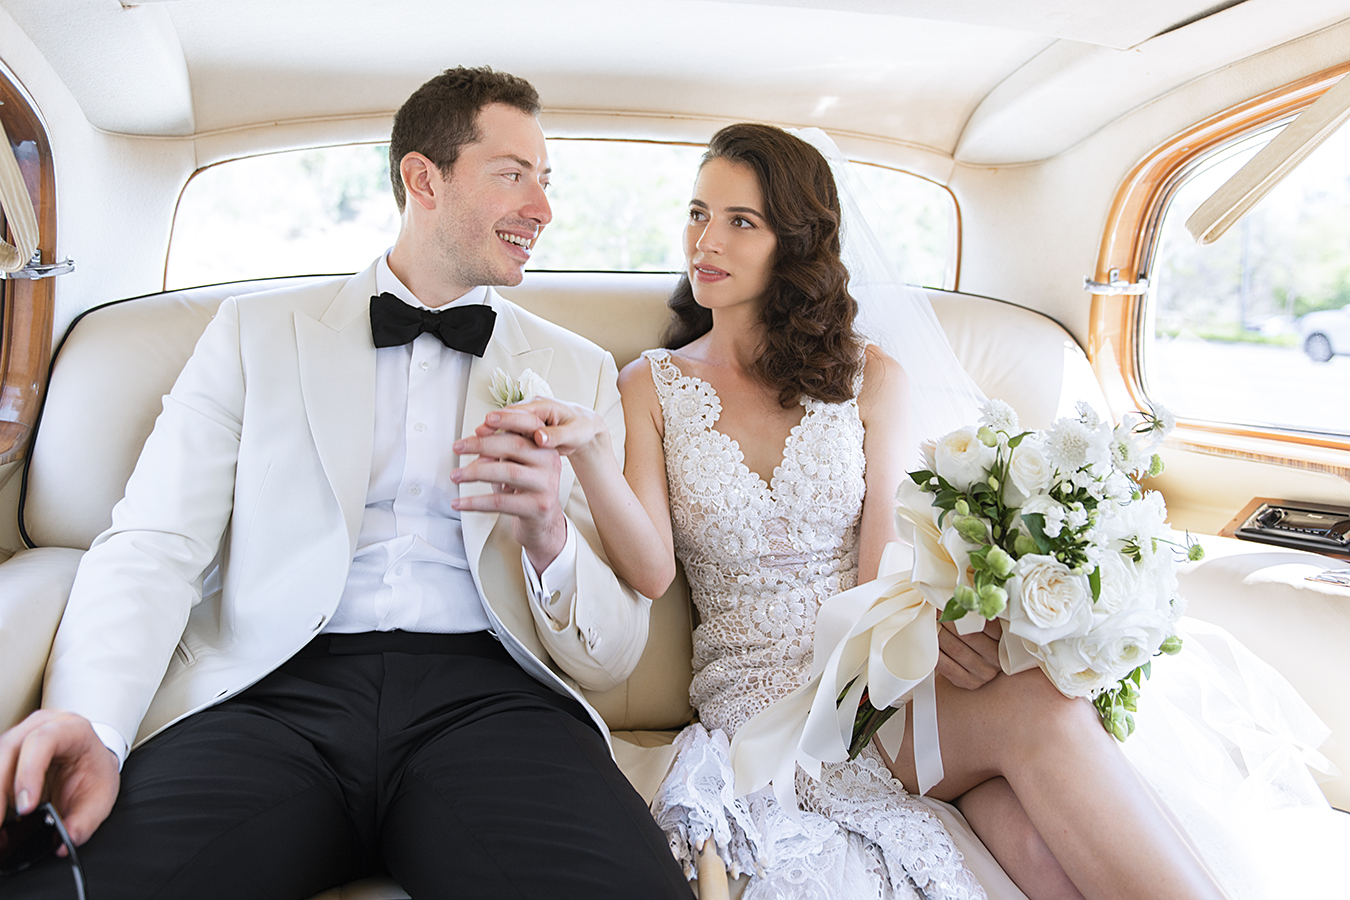 1 Bridal makeup cristinga and hairstyling Beauty Affair.jpg